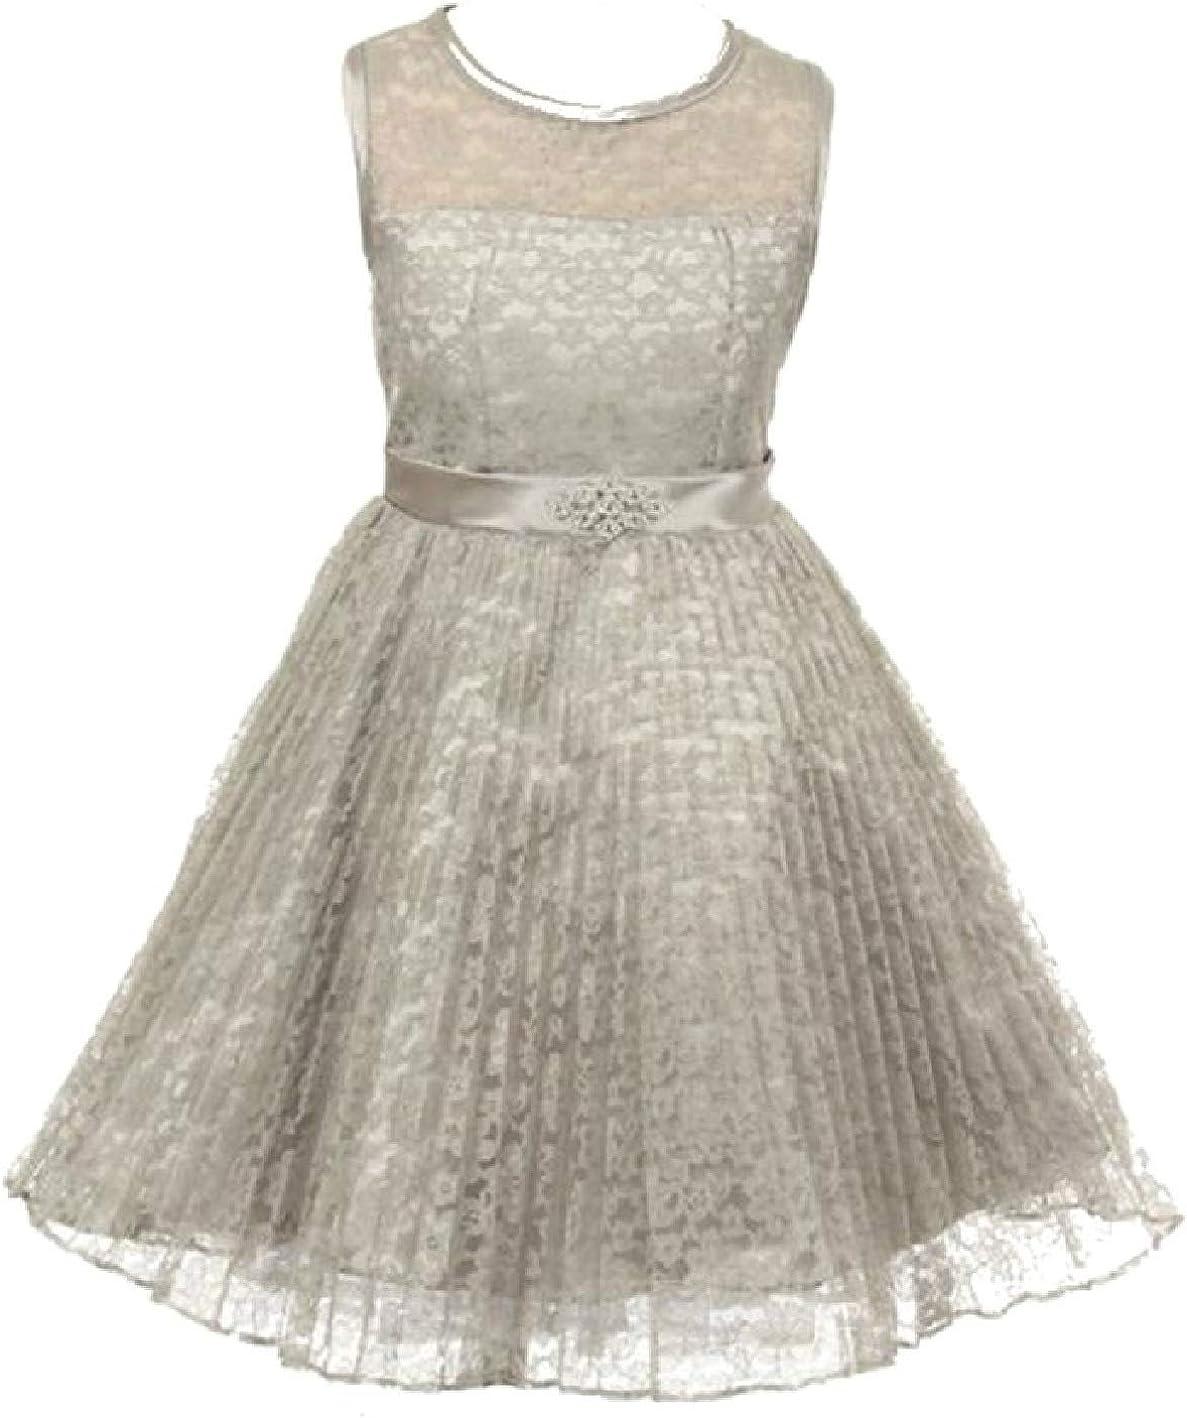 Girls Dress Lace Overlaid Rhinestones Junior Bridesmaid Flower Girl Dress